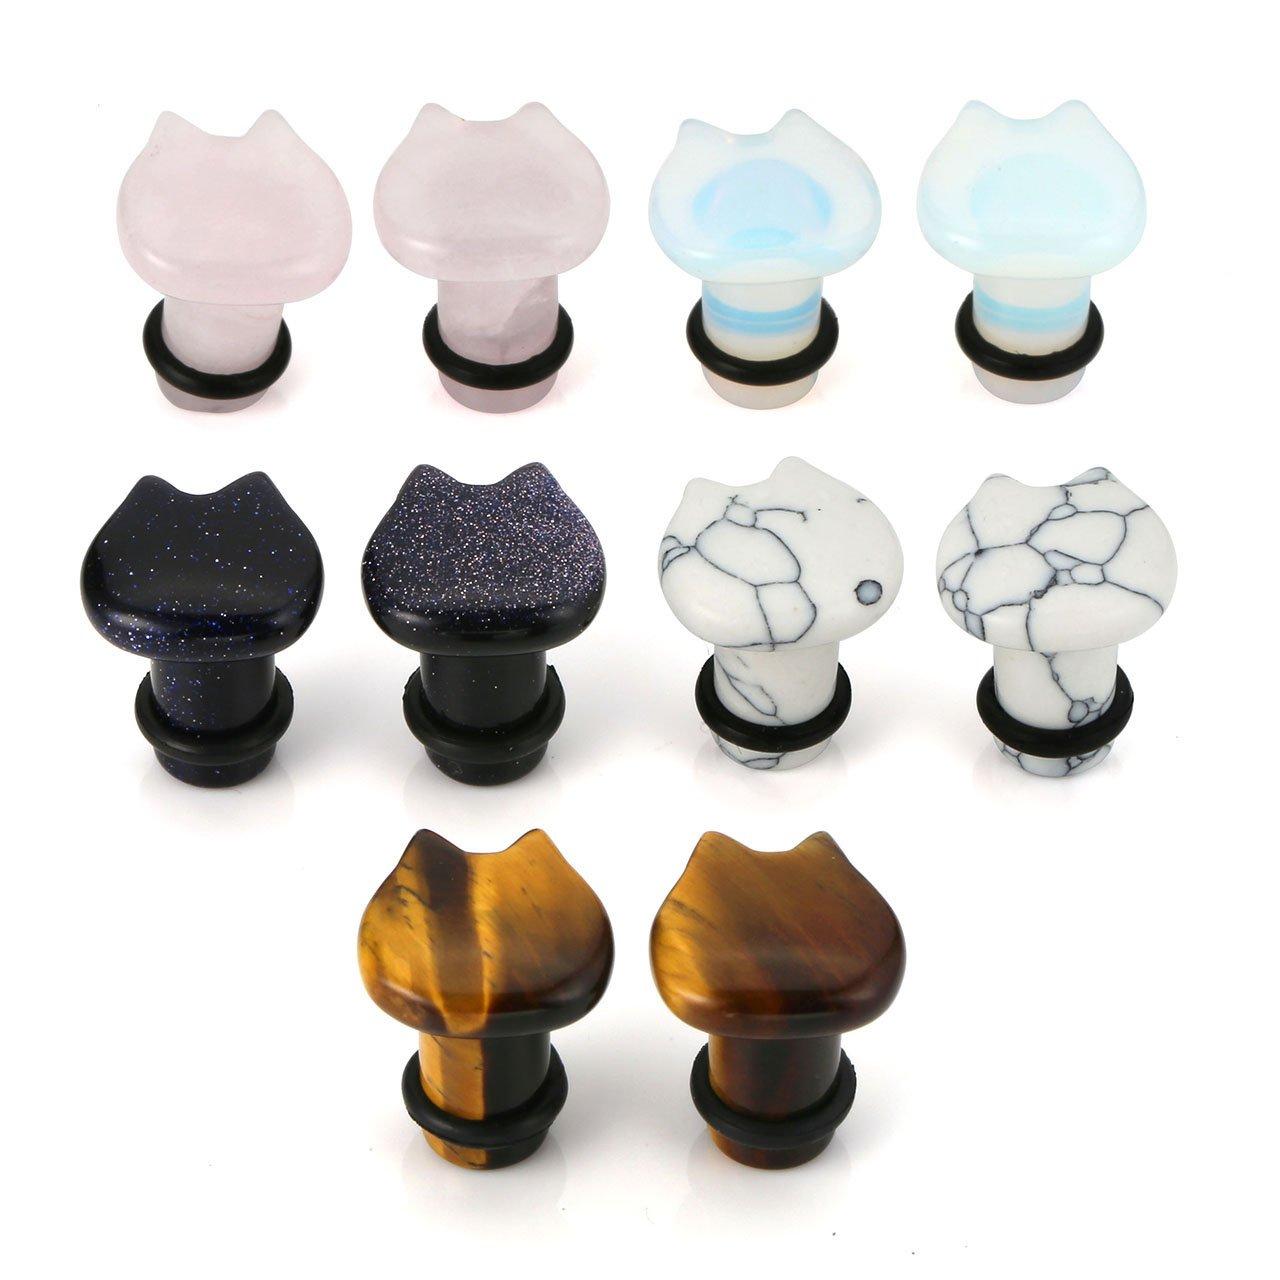 BOPREINA 5 Pairs Organic Stone Cute Cat Ear Stretching Plugs Gauge 2g - 5/8''